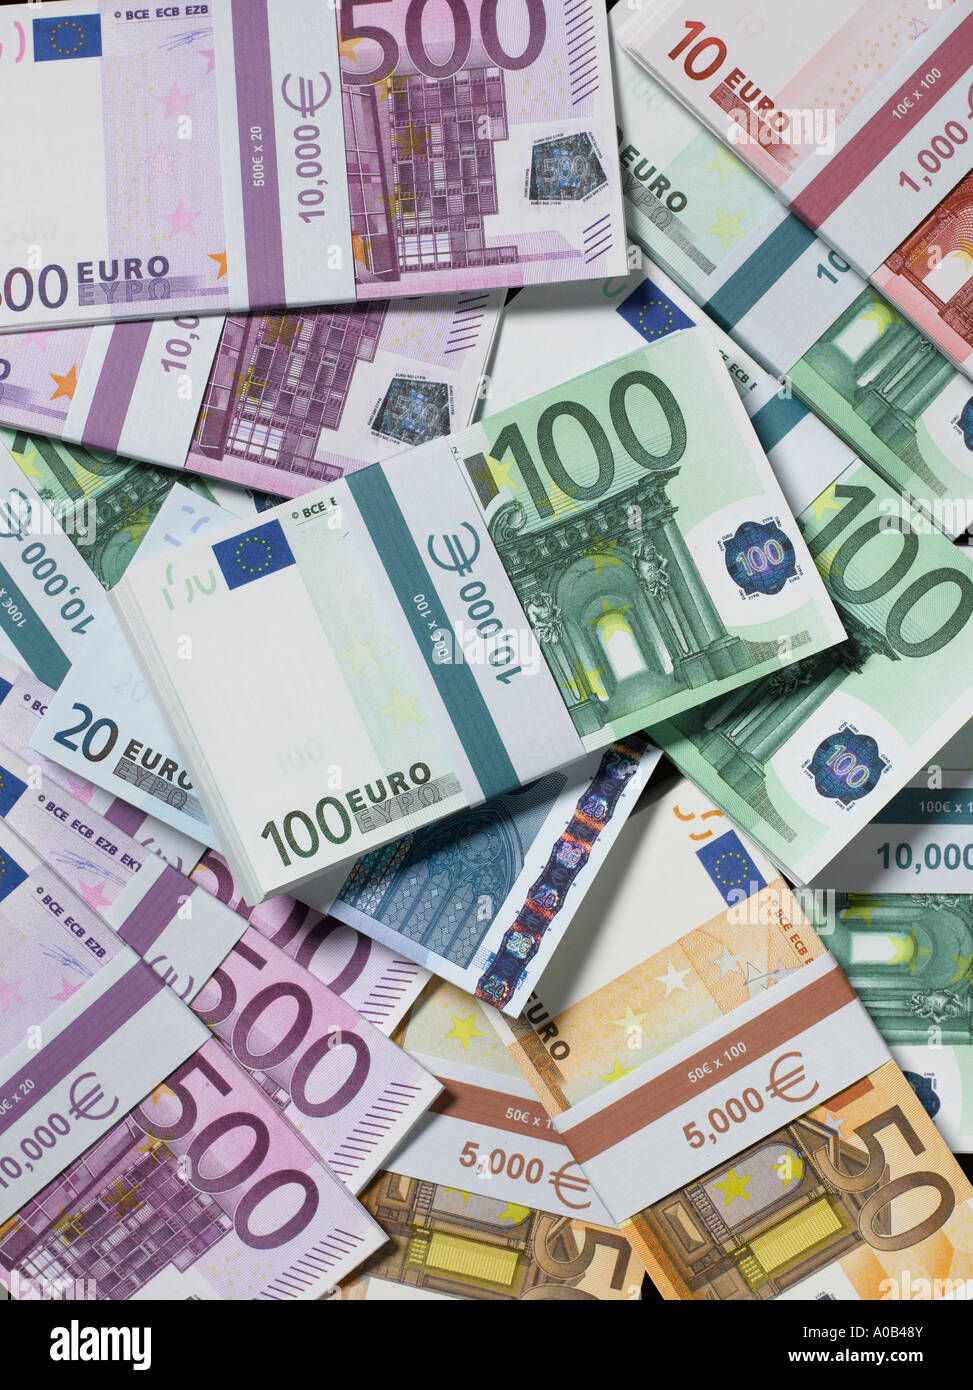 Banded Euros - Stock Image